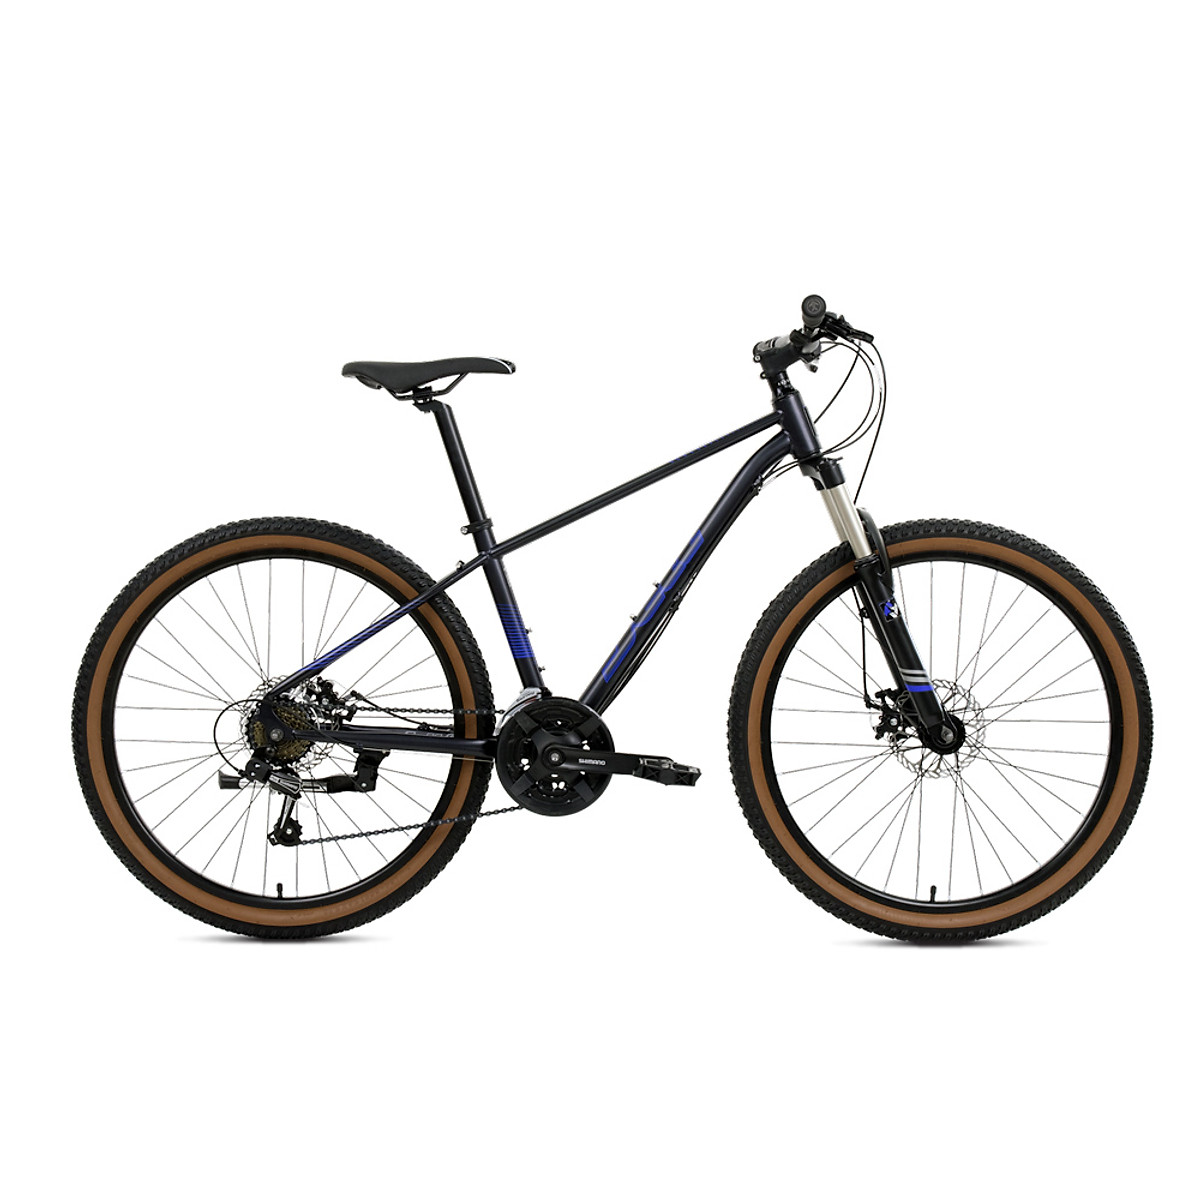 Mua Xe đạp thể thao Jett Cycles Octane (Đen) - Size L